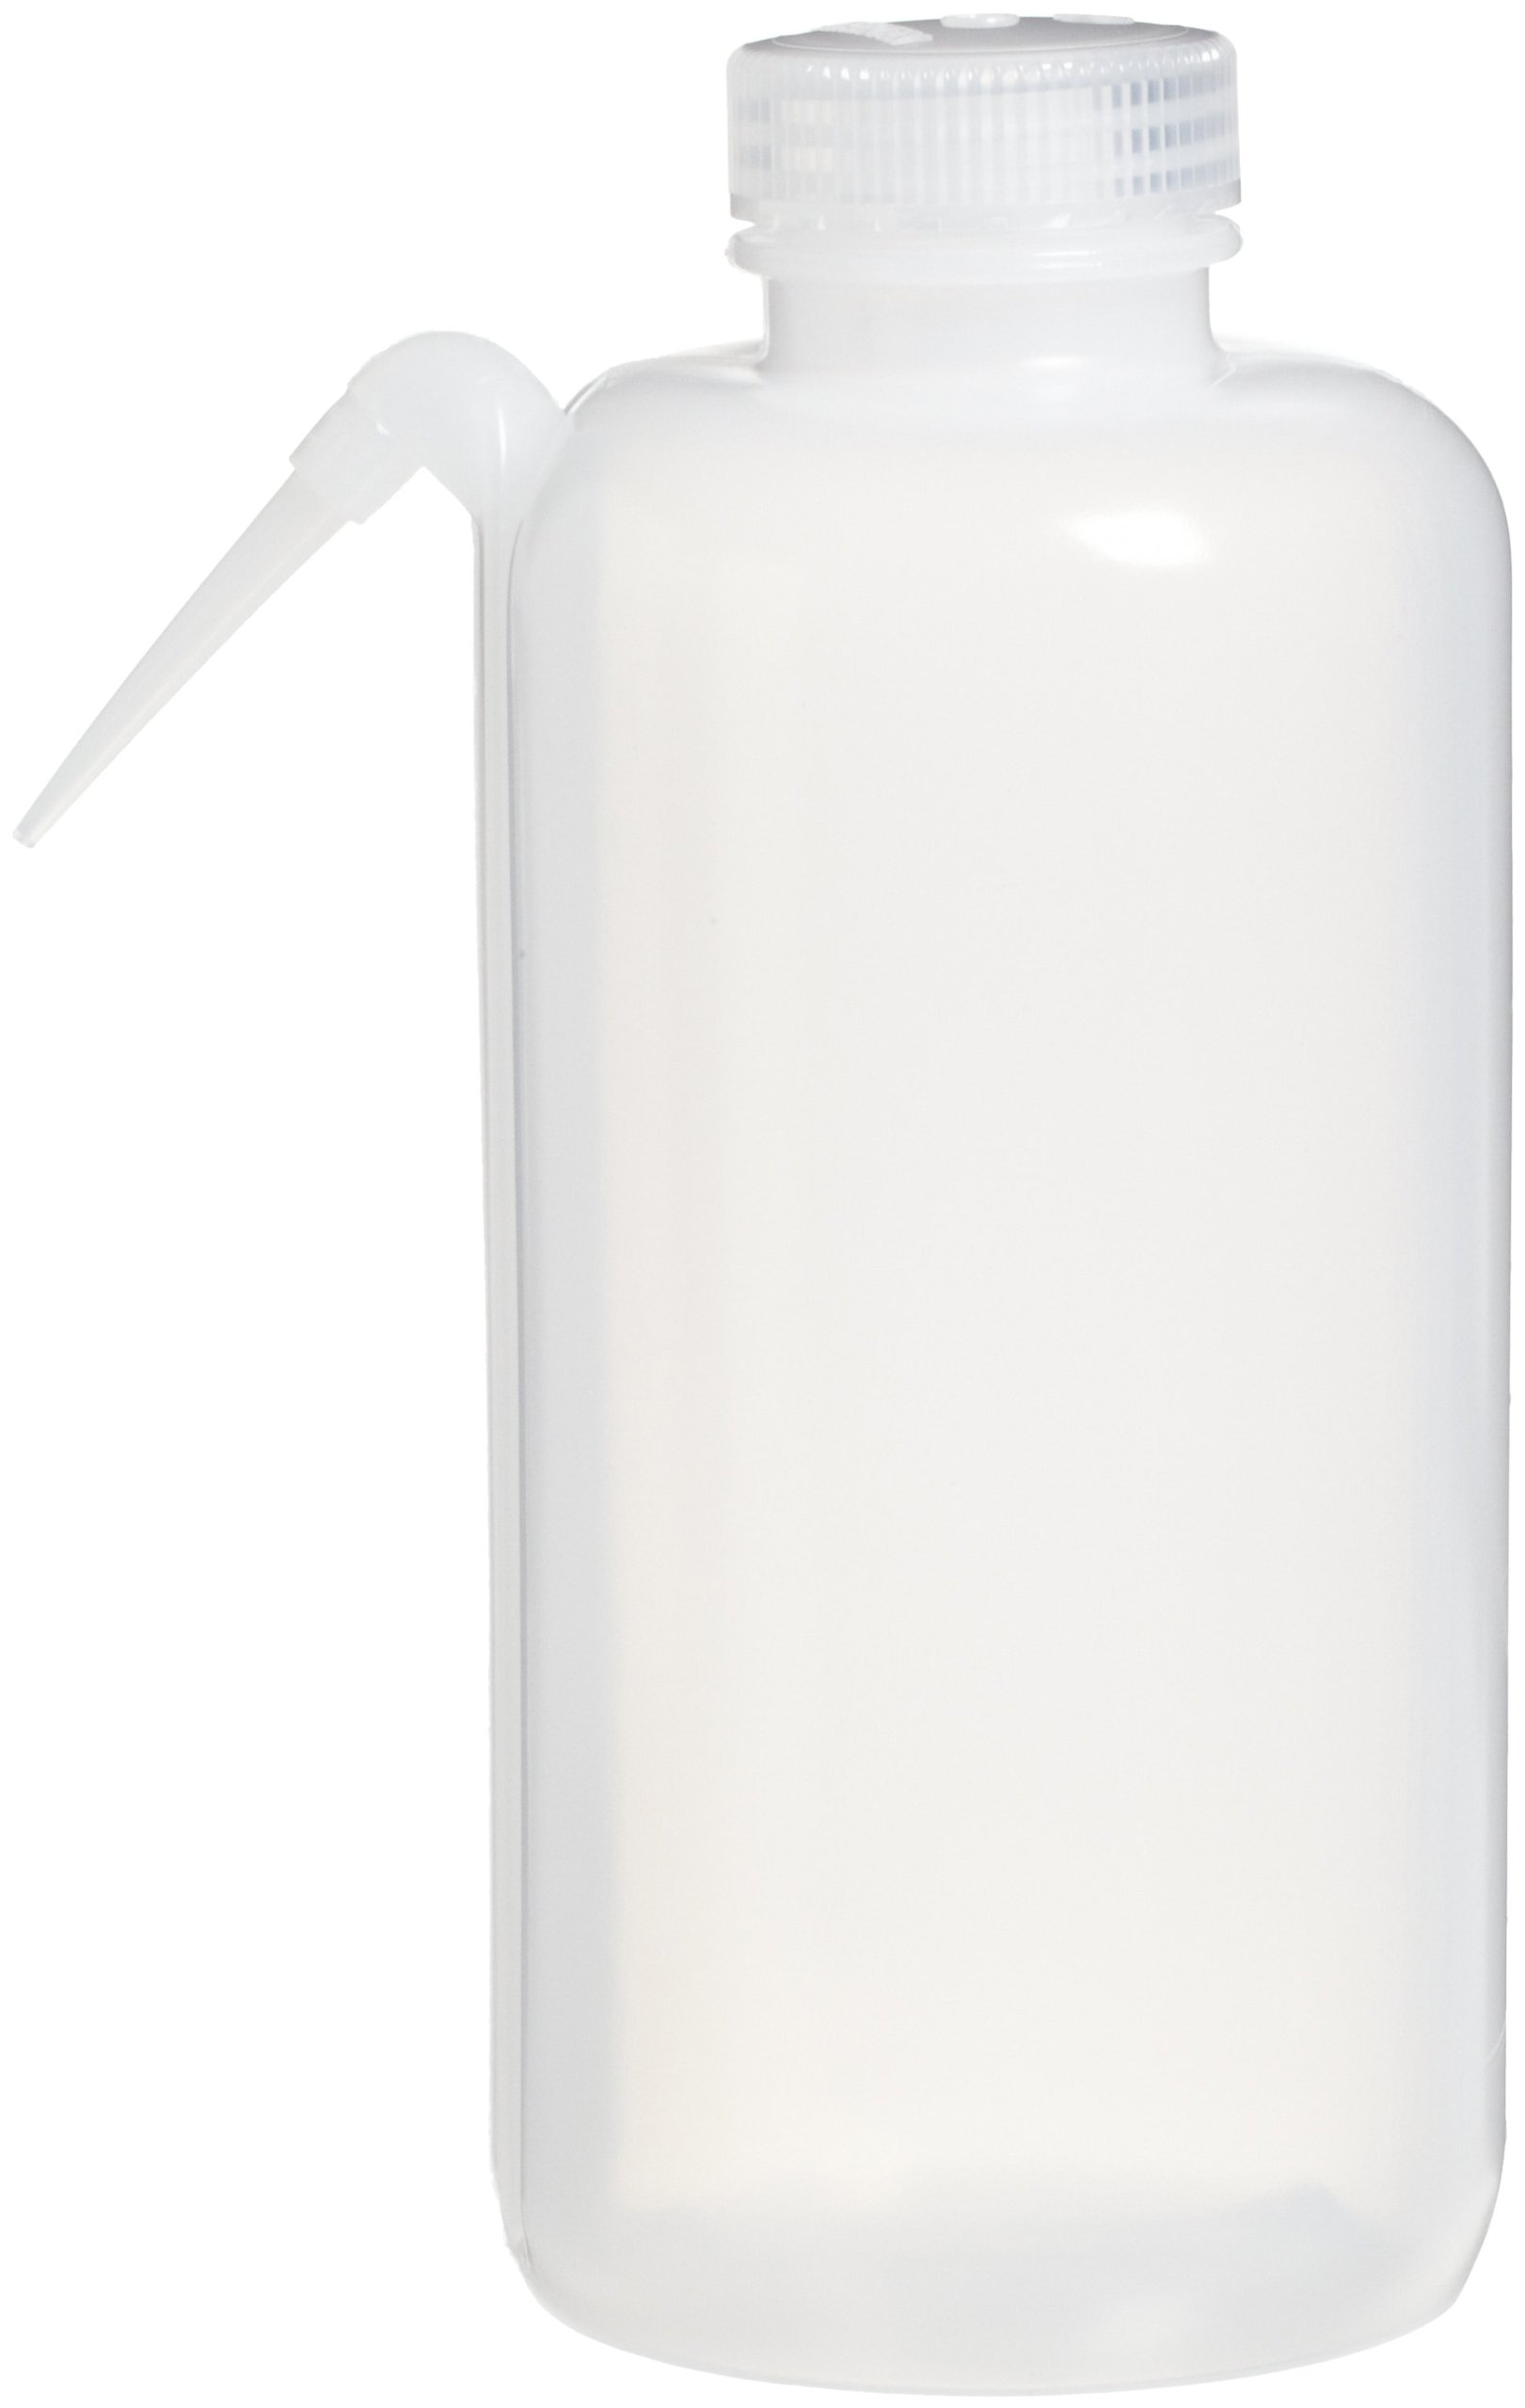 Nalgene 2402-1000 Unitary Wash Bottle,  LDPE, 1000mL (Pack of 2)